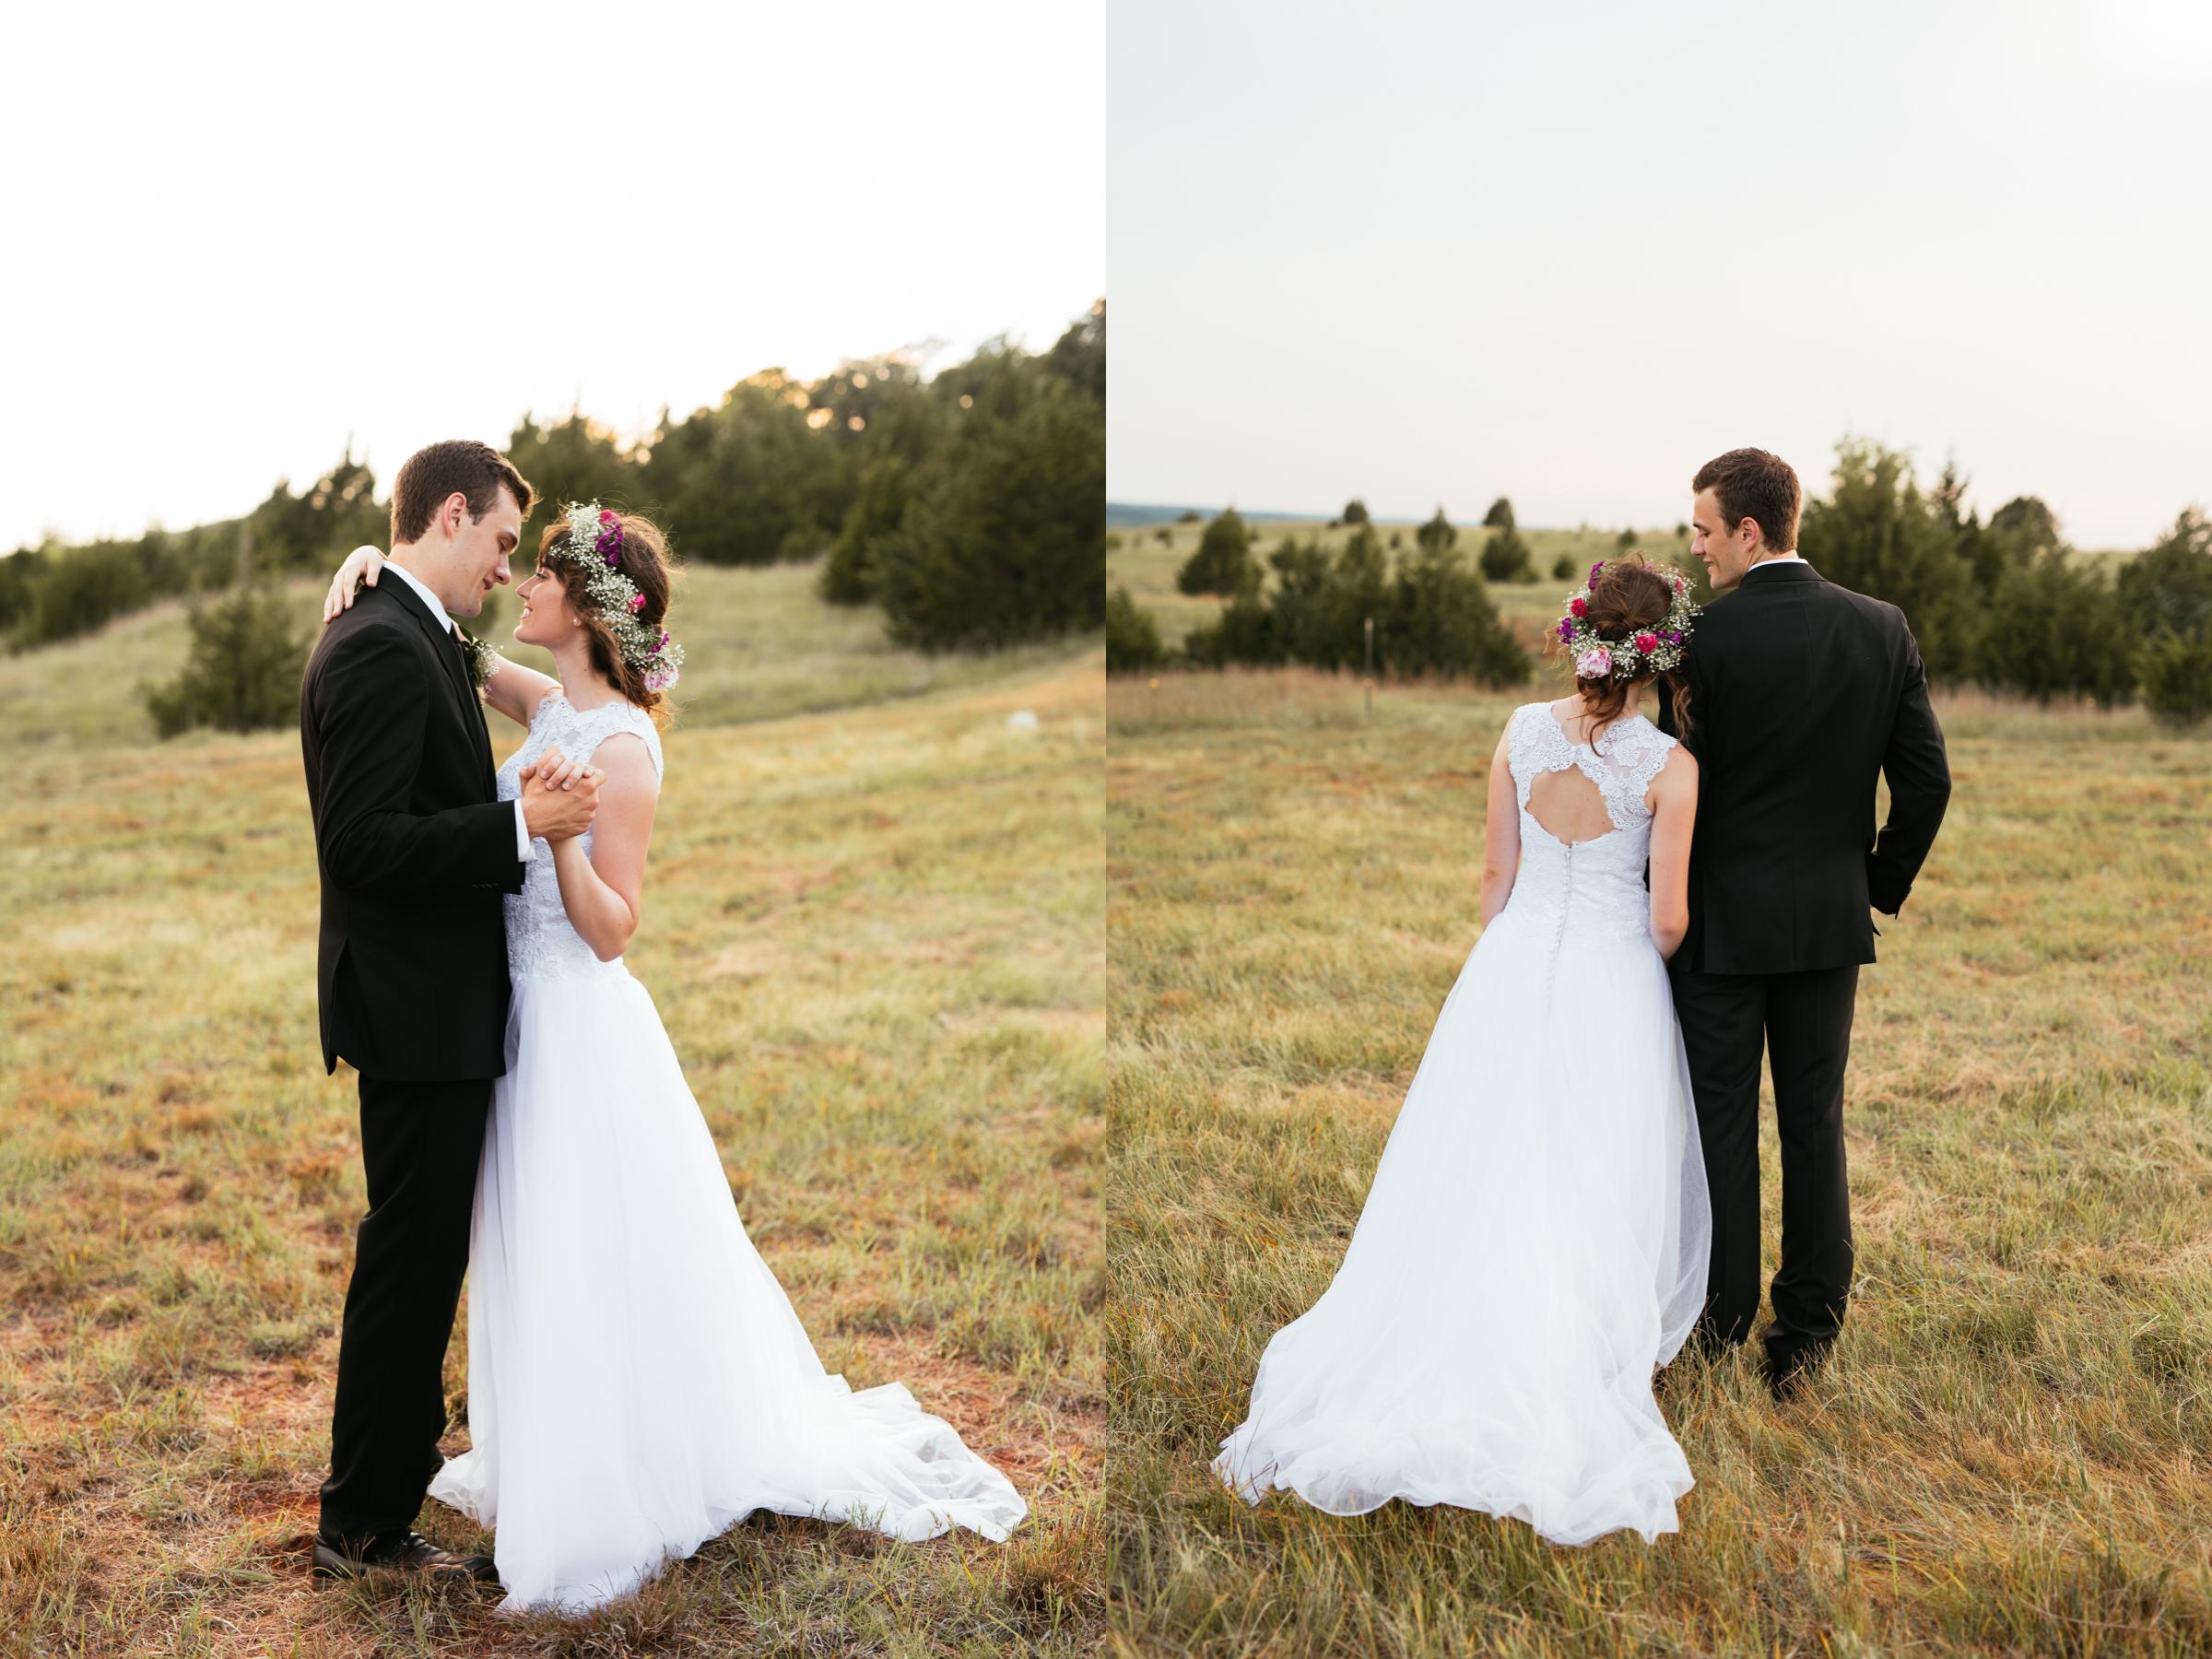 McCurrach Wedding14.jpg